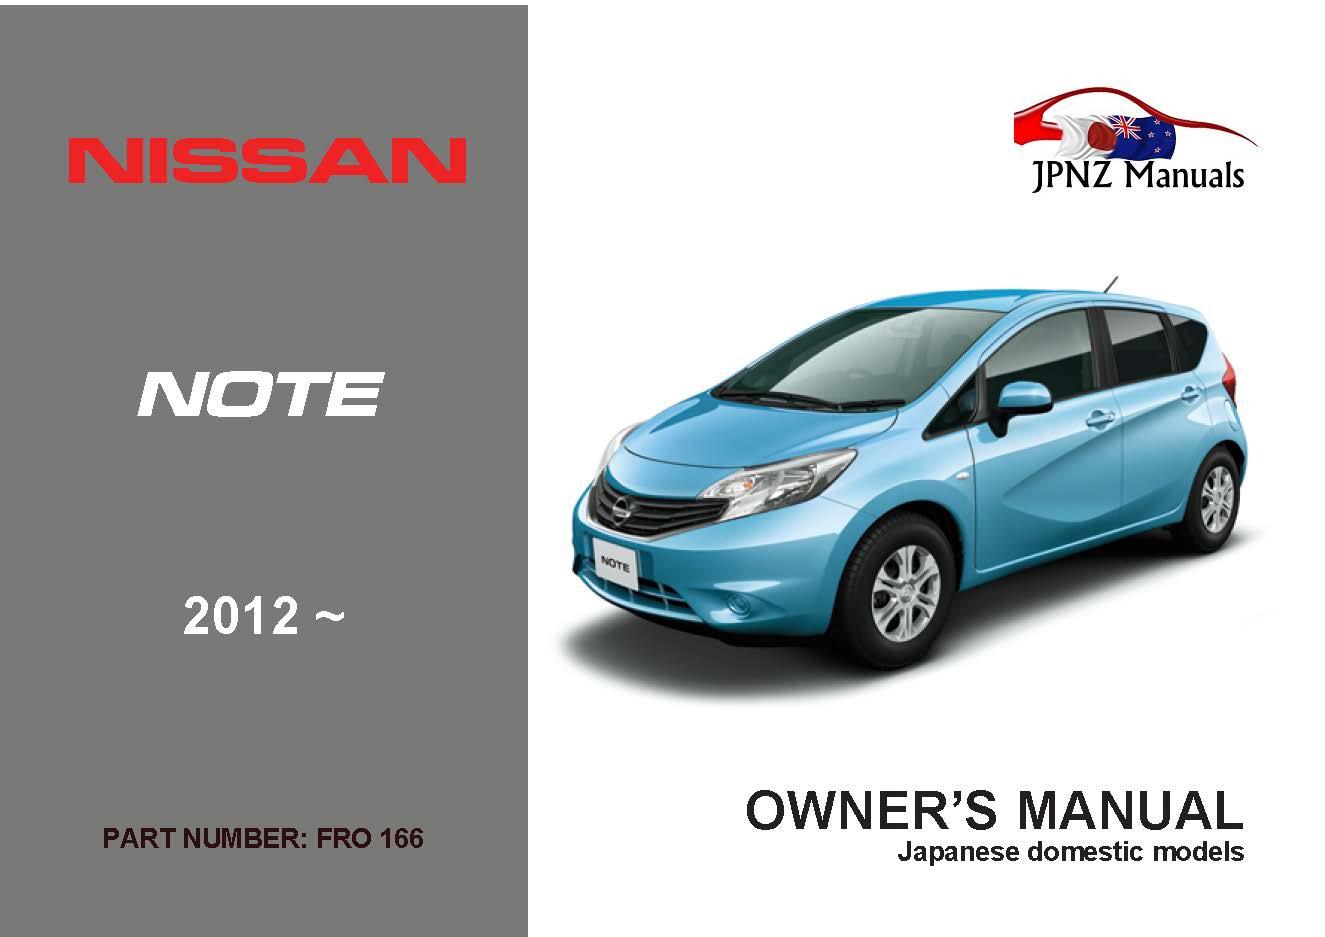 nissan note car owners manual 2012 present e12 rh jpnz co nz Honda CMX 250 Owner's Manual Honda Civic Owners Manual